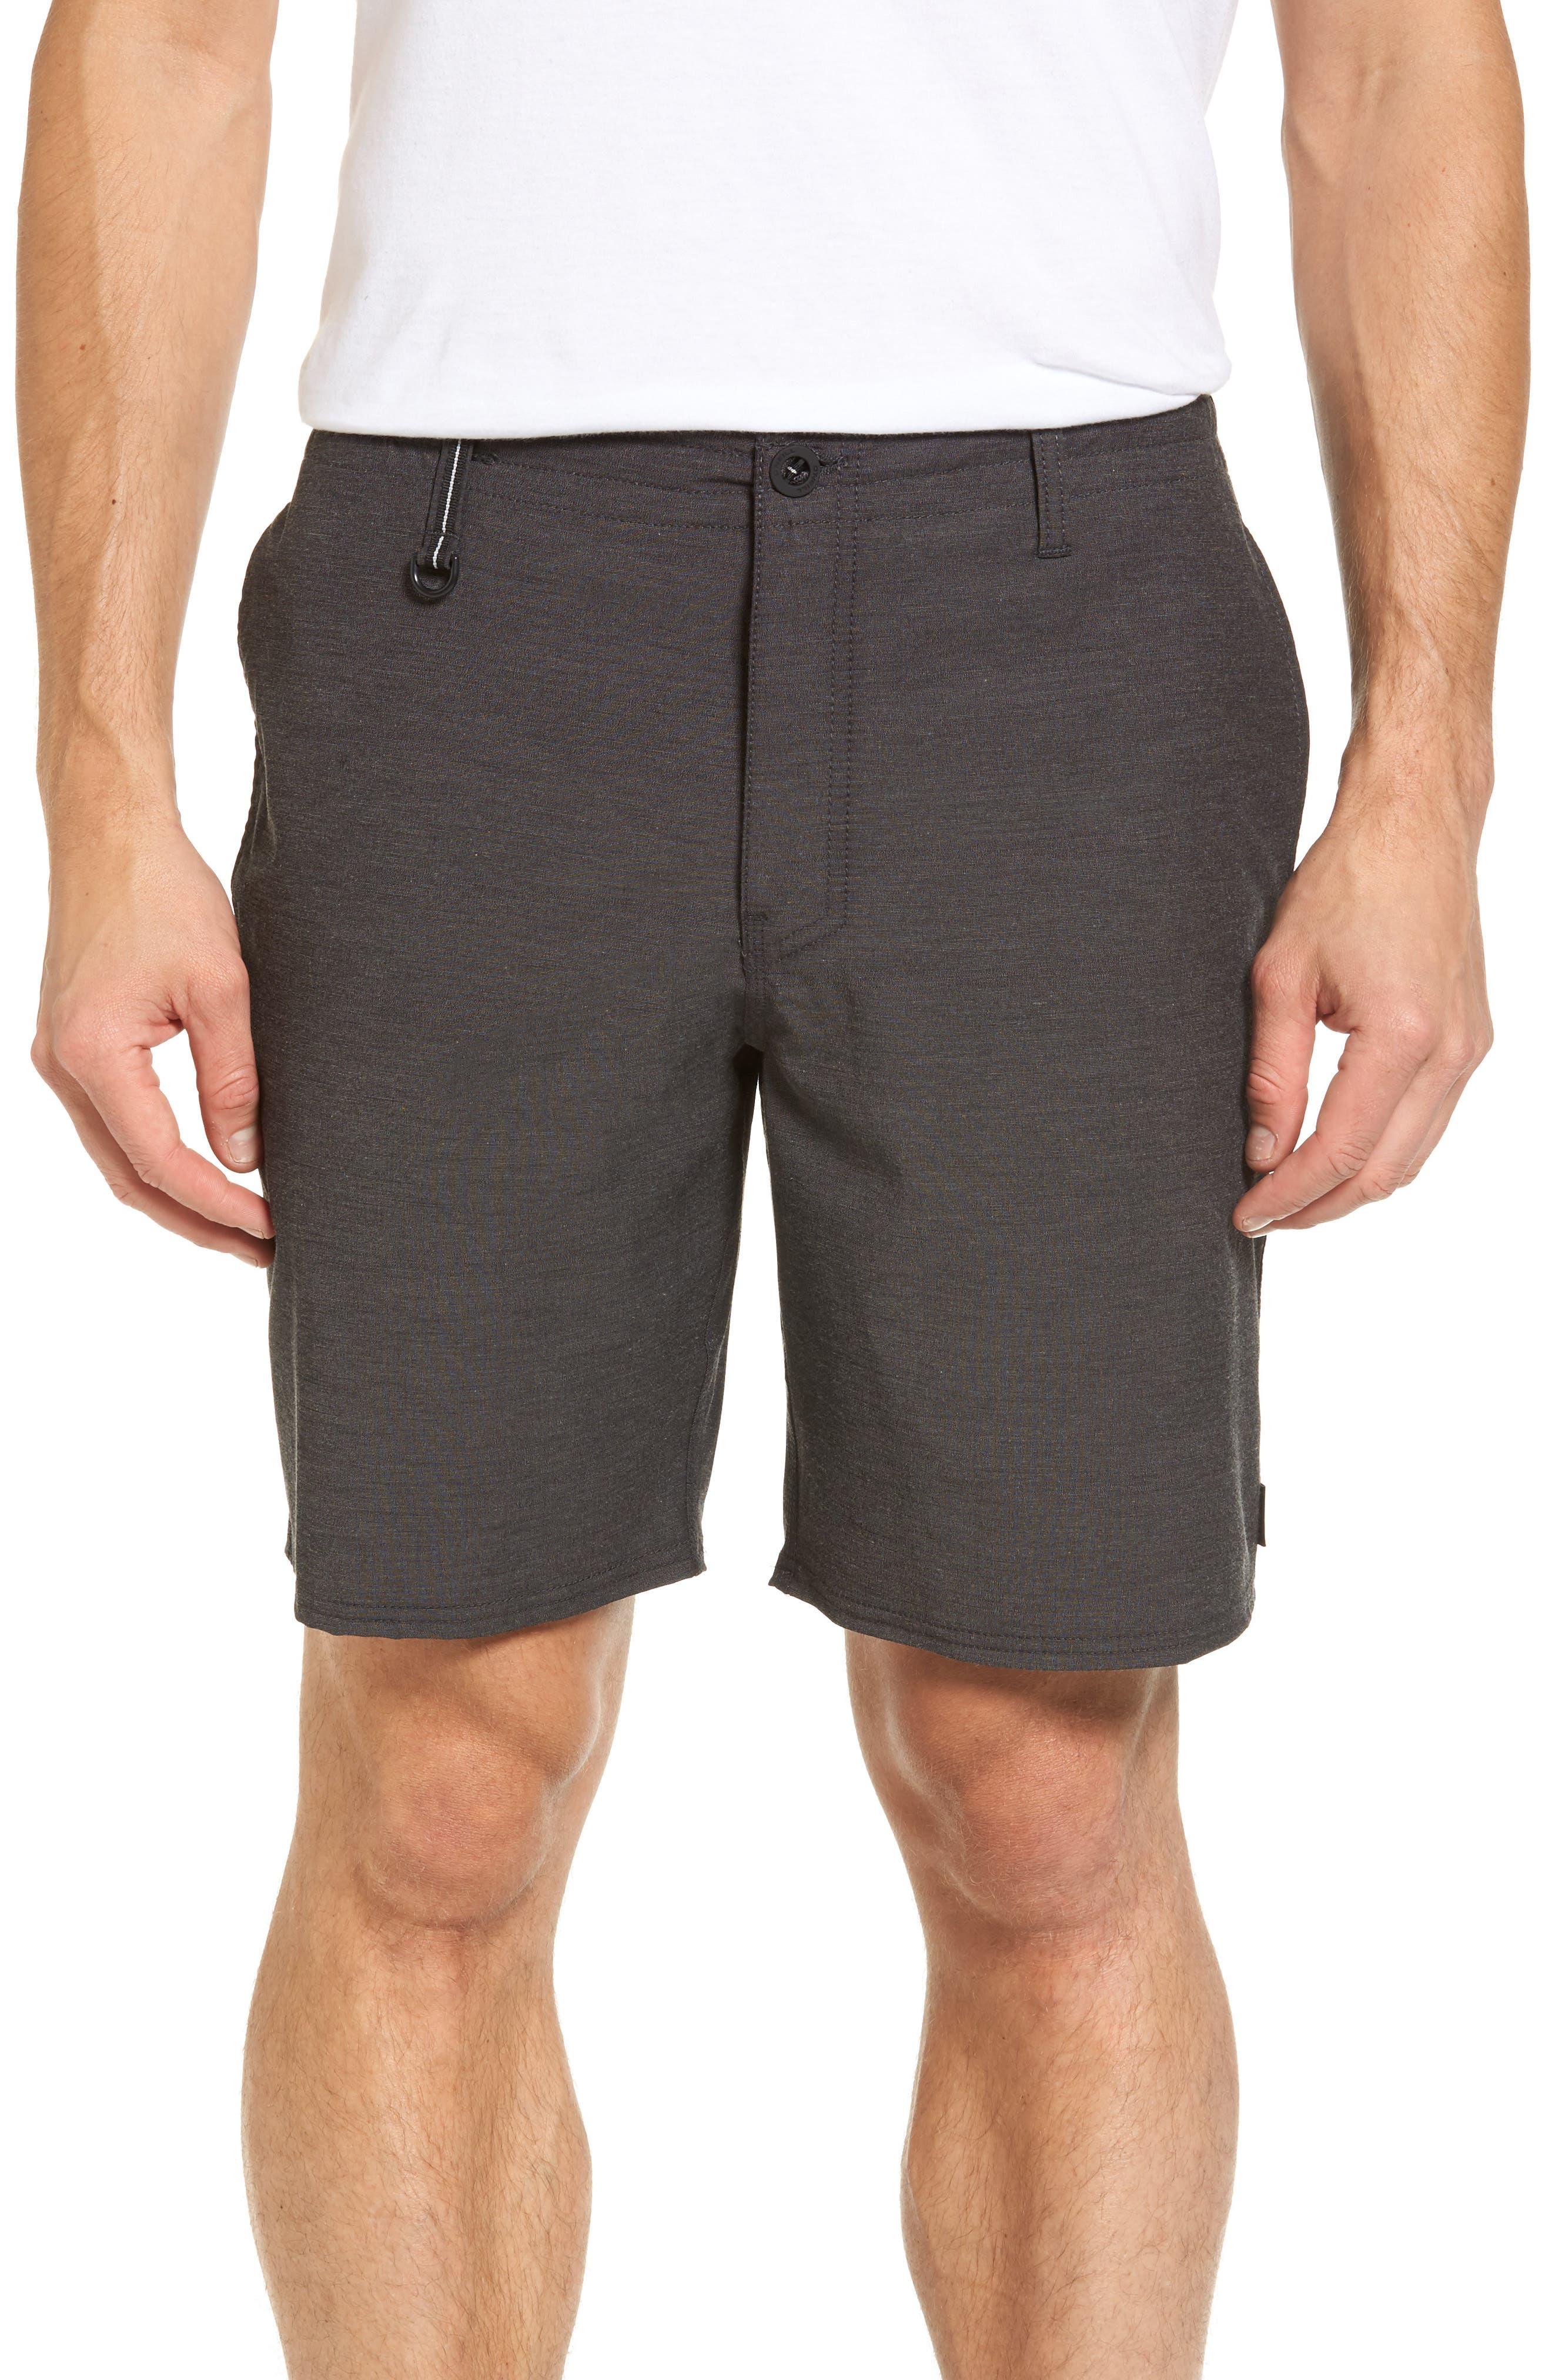 Traveler Recon Hybrid Shorts,                         Main,                         color, 001